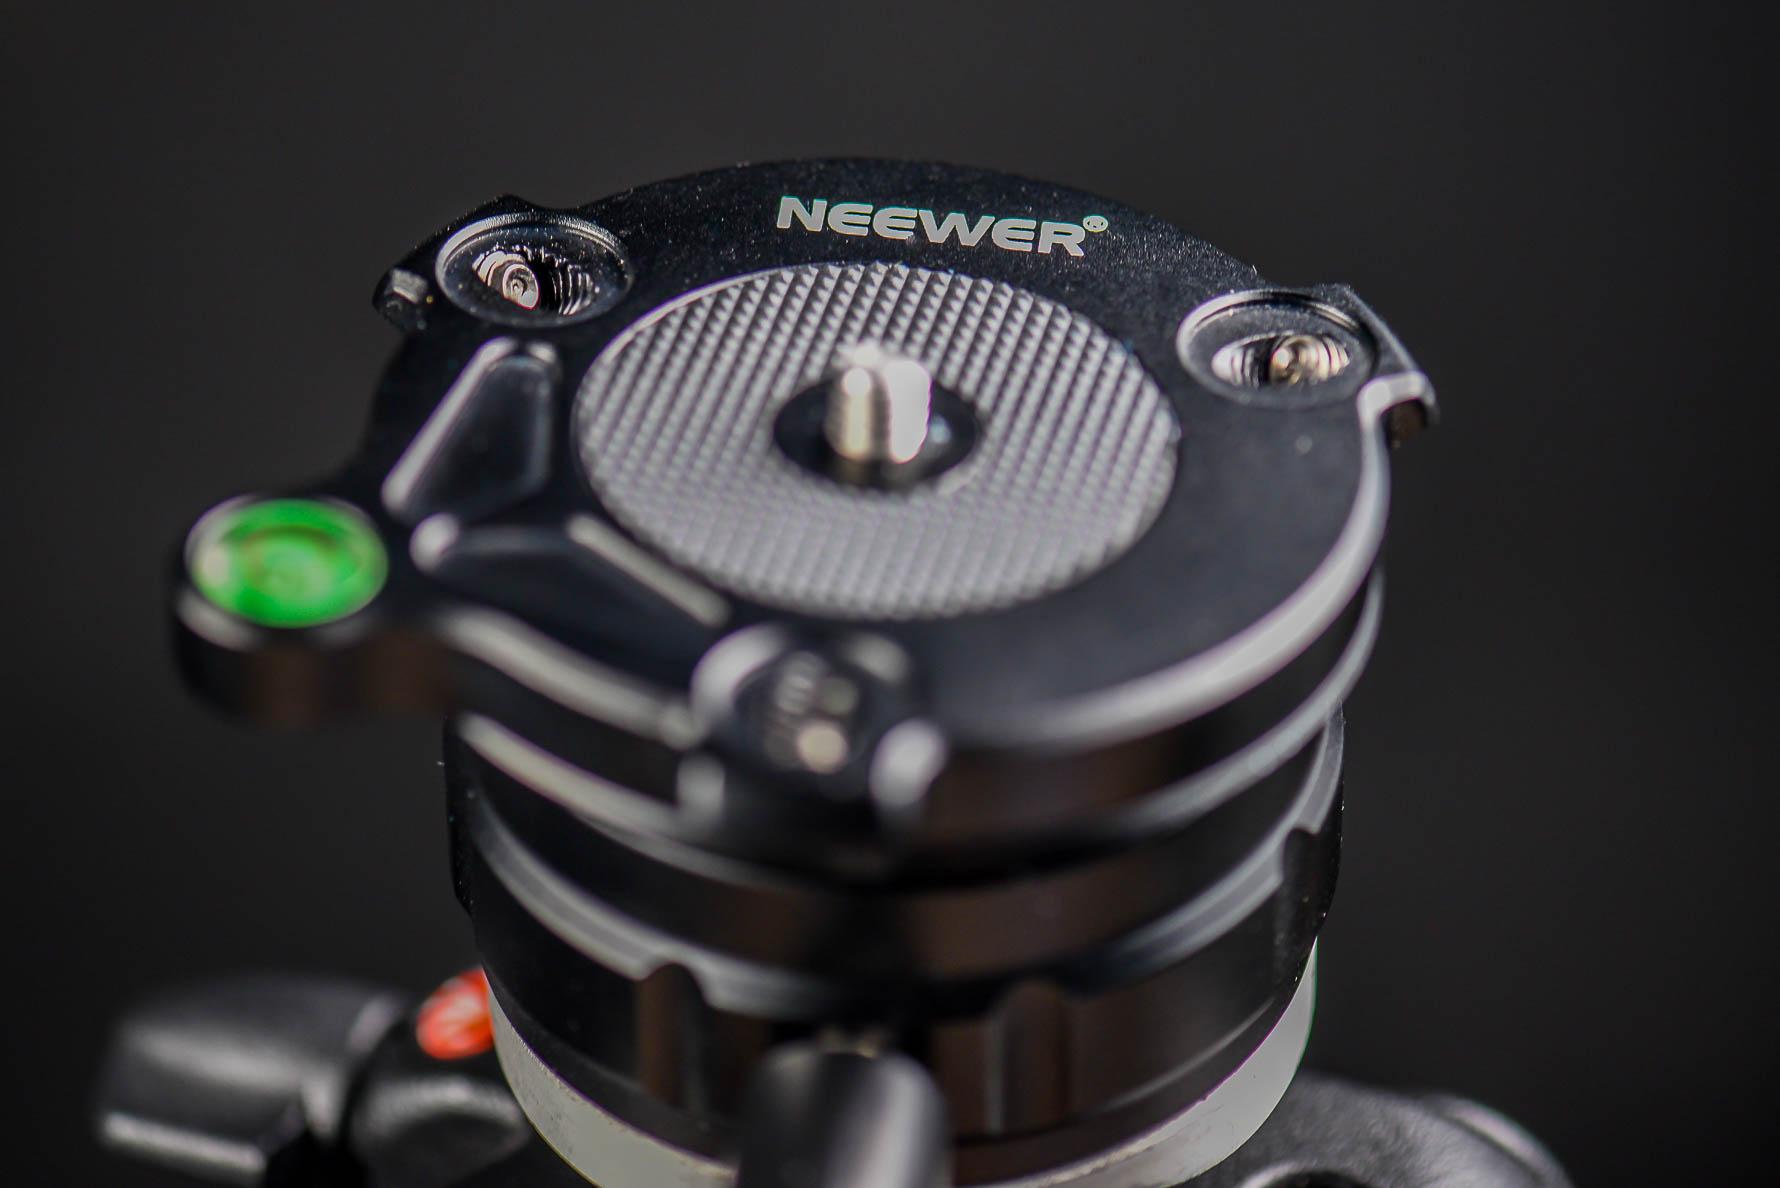 Neewer Tripod Leveling Base review